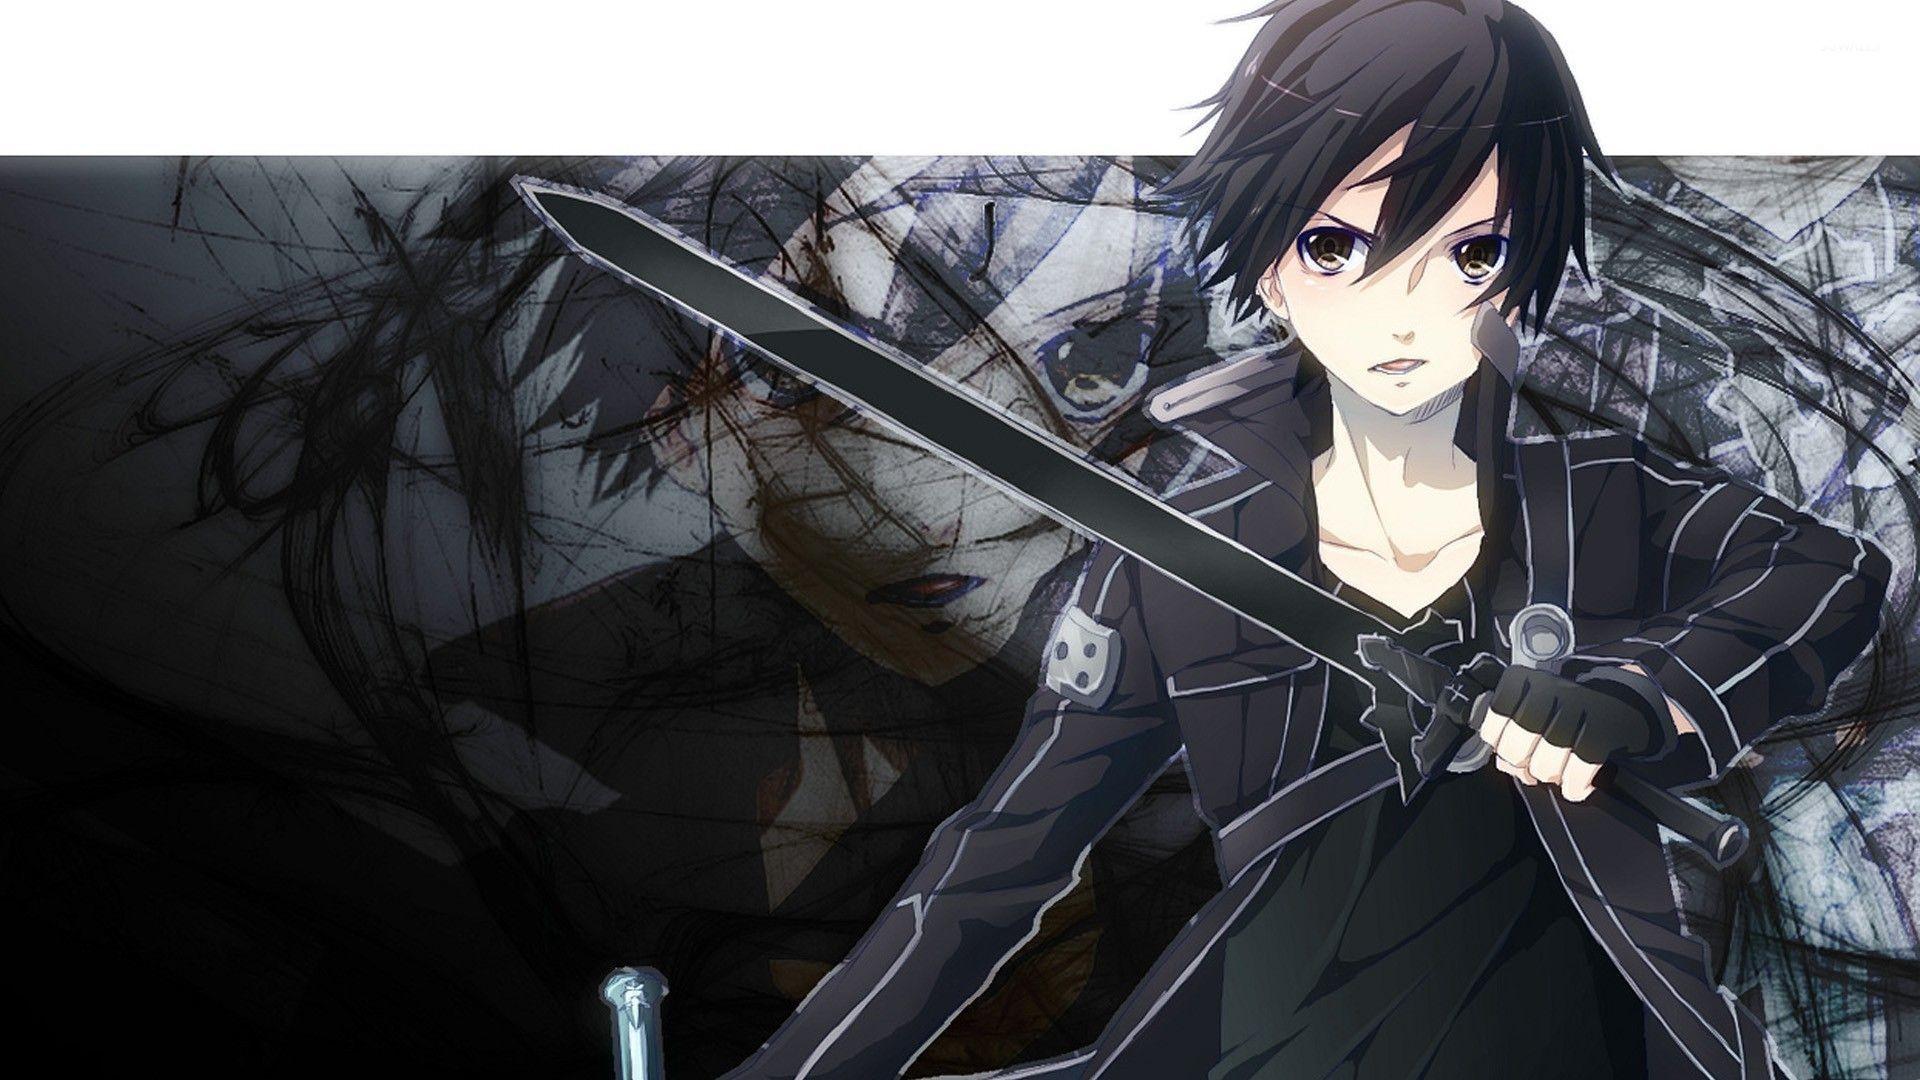 Kirito – Sword Art Online [4] wallpaper jpg